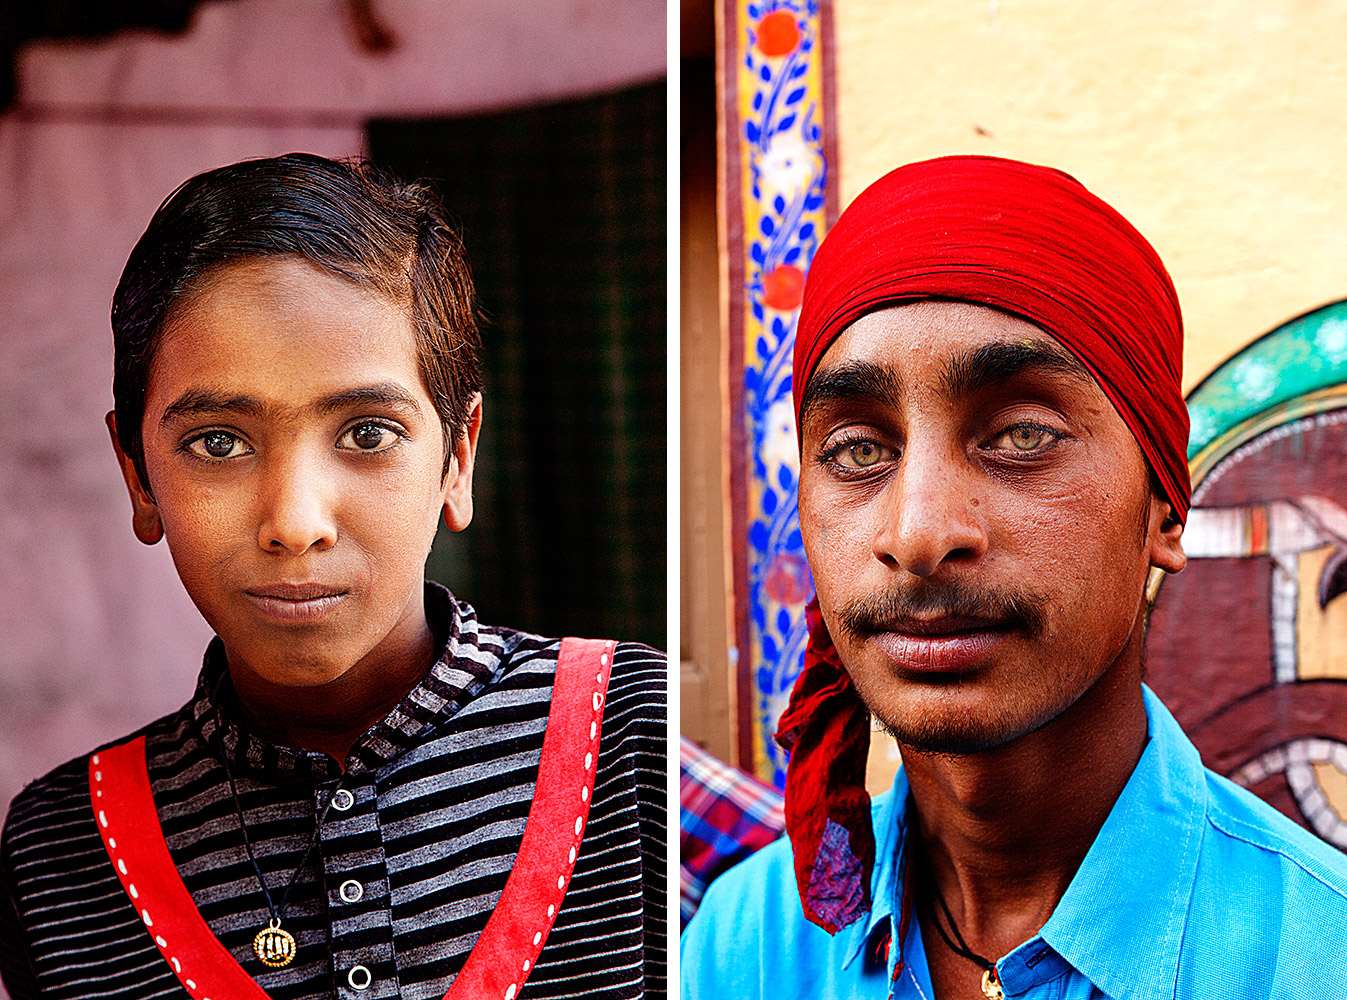 India-Portraits-DUO-003.jpg